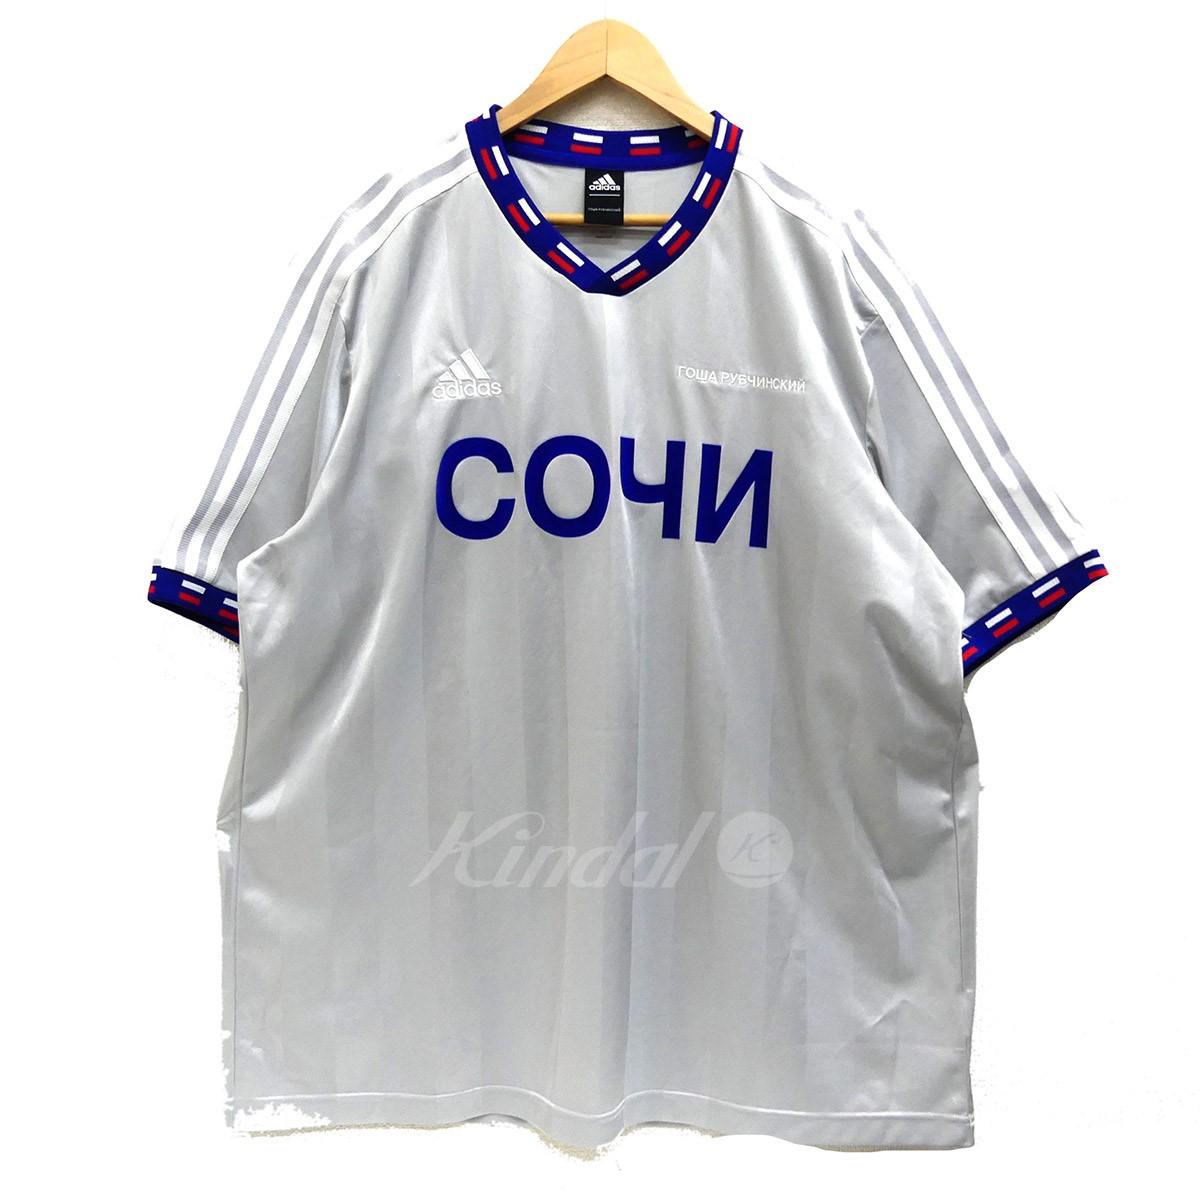 1e0ee7905 Gosha Rubchinskiy X Adidas X DSMG Player T-SHIRT 2018SS Russia World Cup  silver X ...